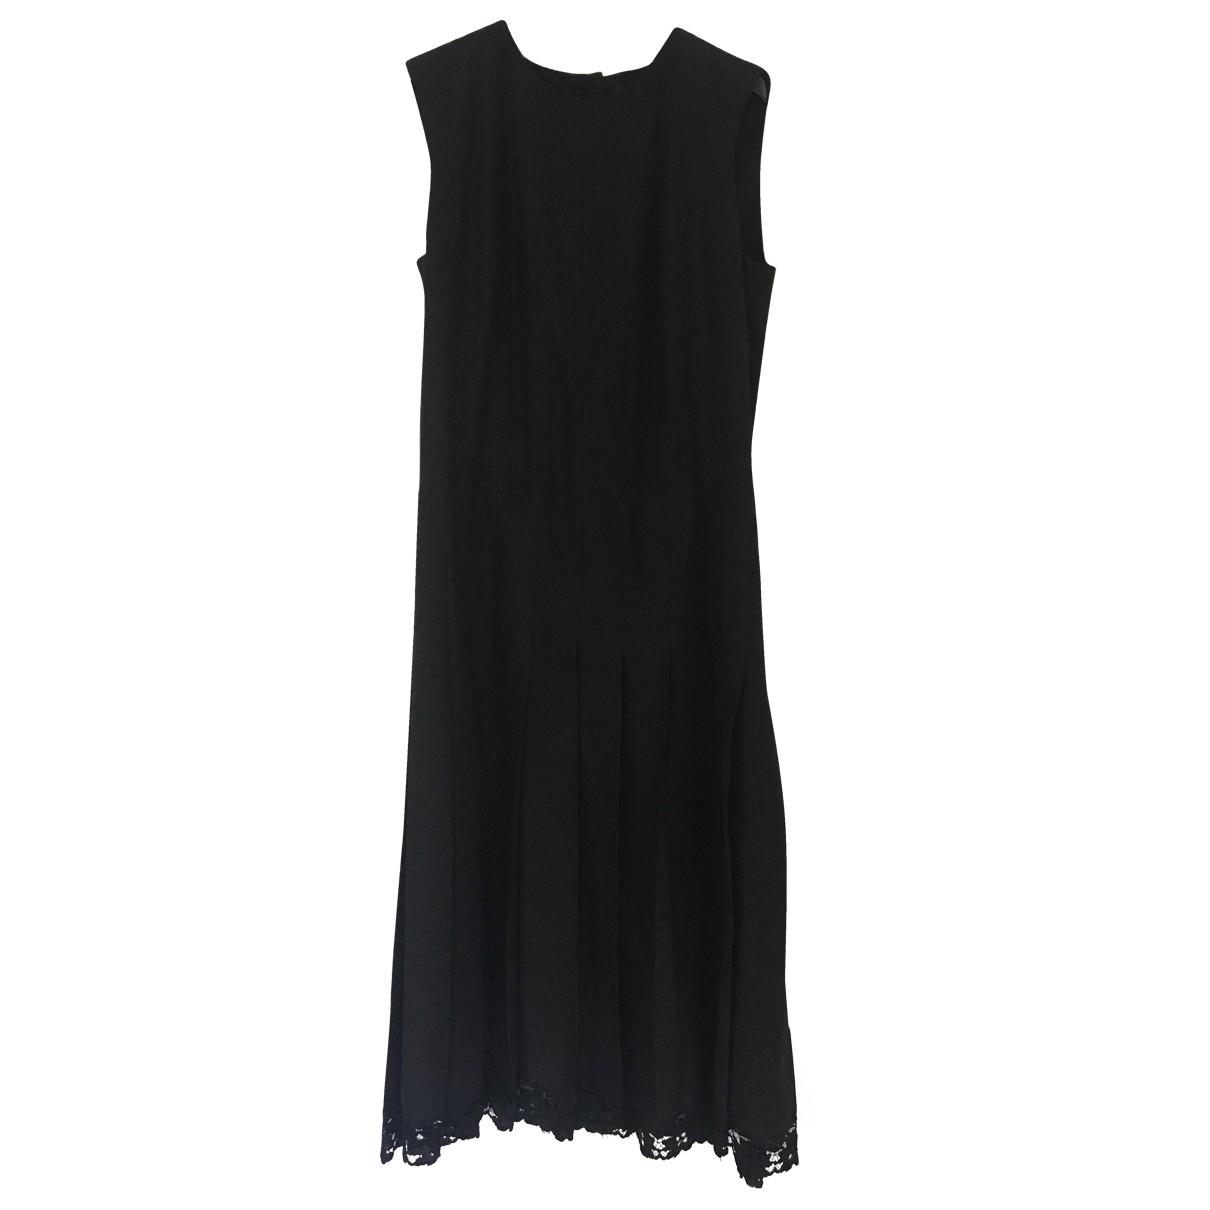 Marc Jacobs \N Kleid in  Schwarz Polyester